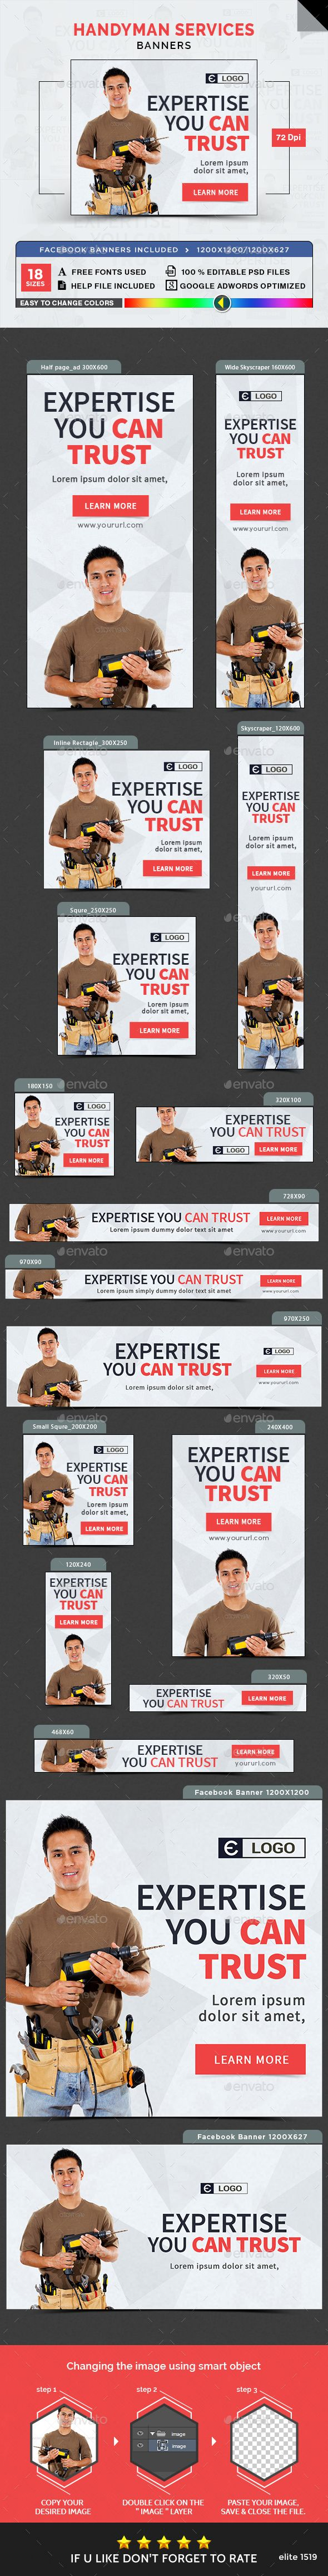 Free handyman price list - Handyman Service Banners